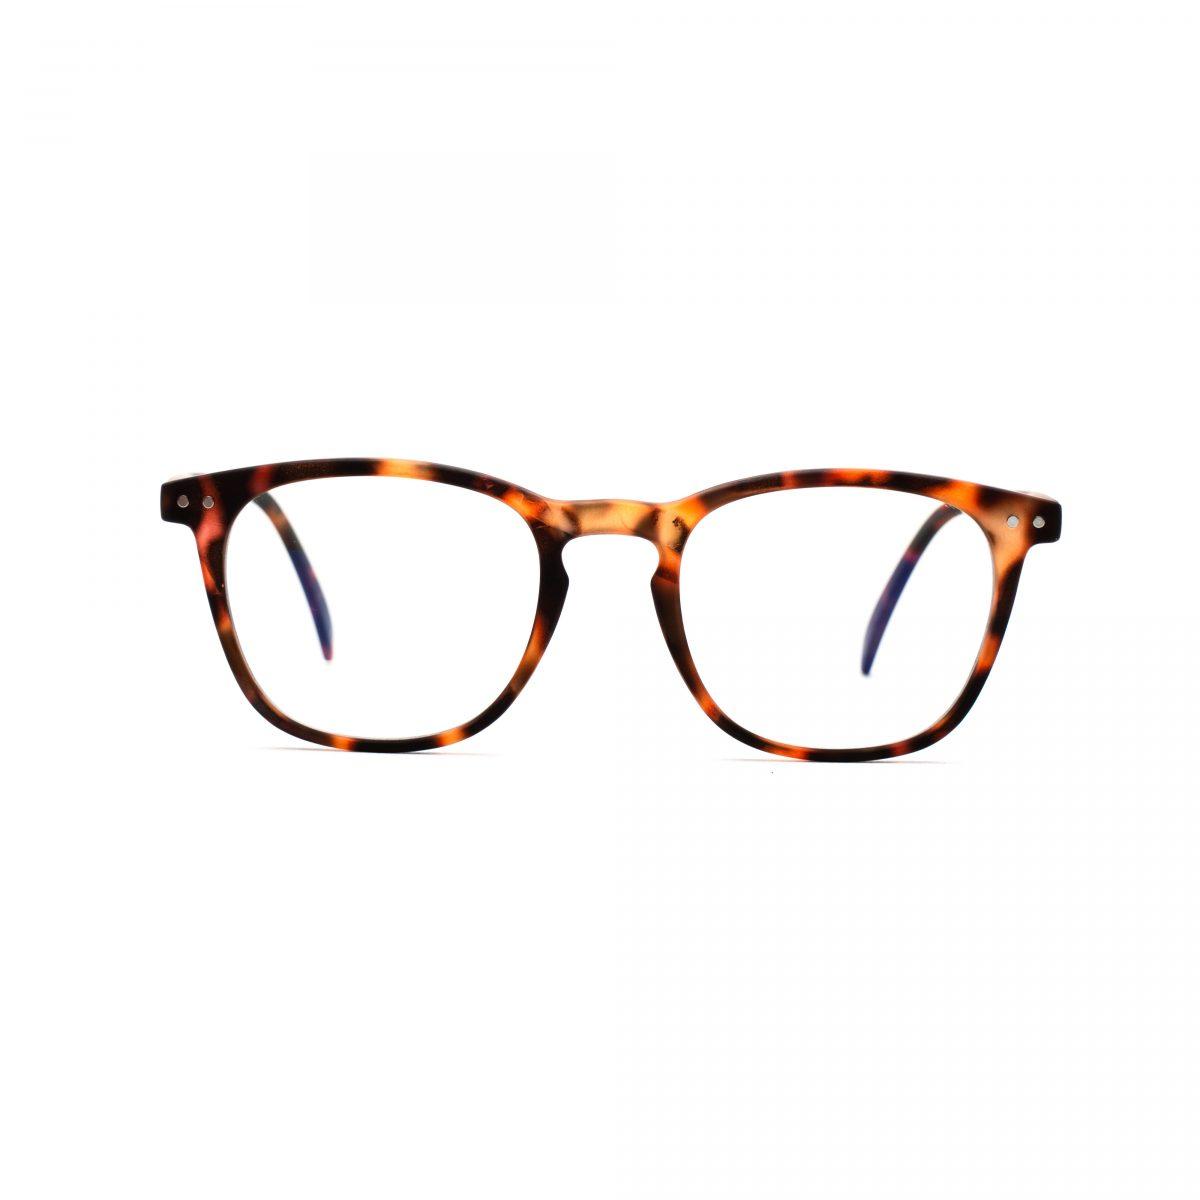 tortois_blue_light_glasses_round_william_front